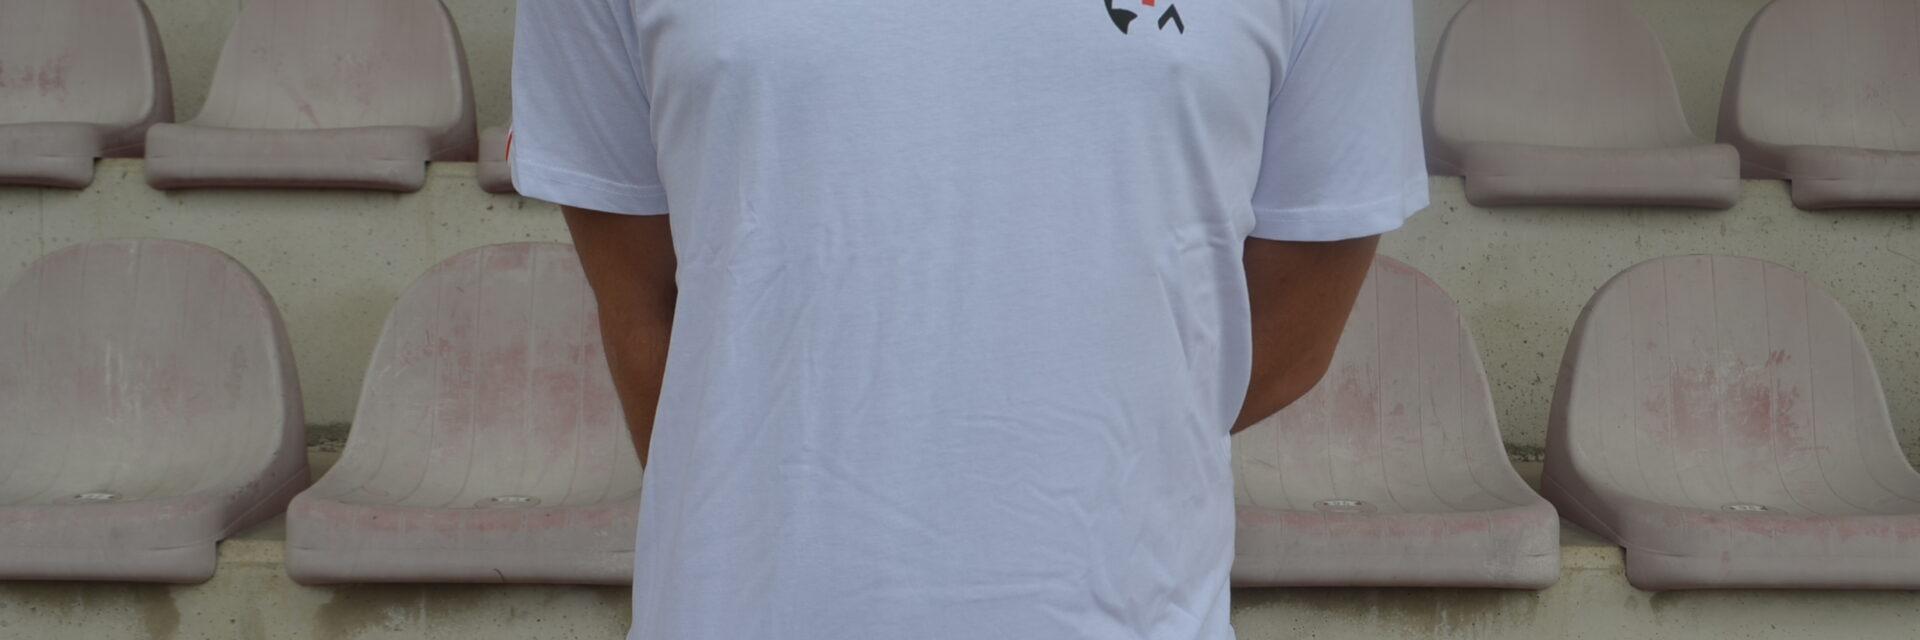 Shirt Vis in de leie